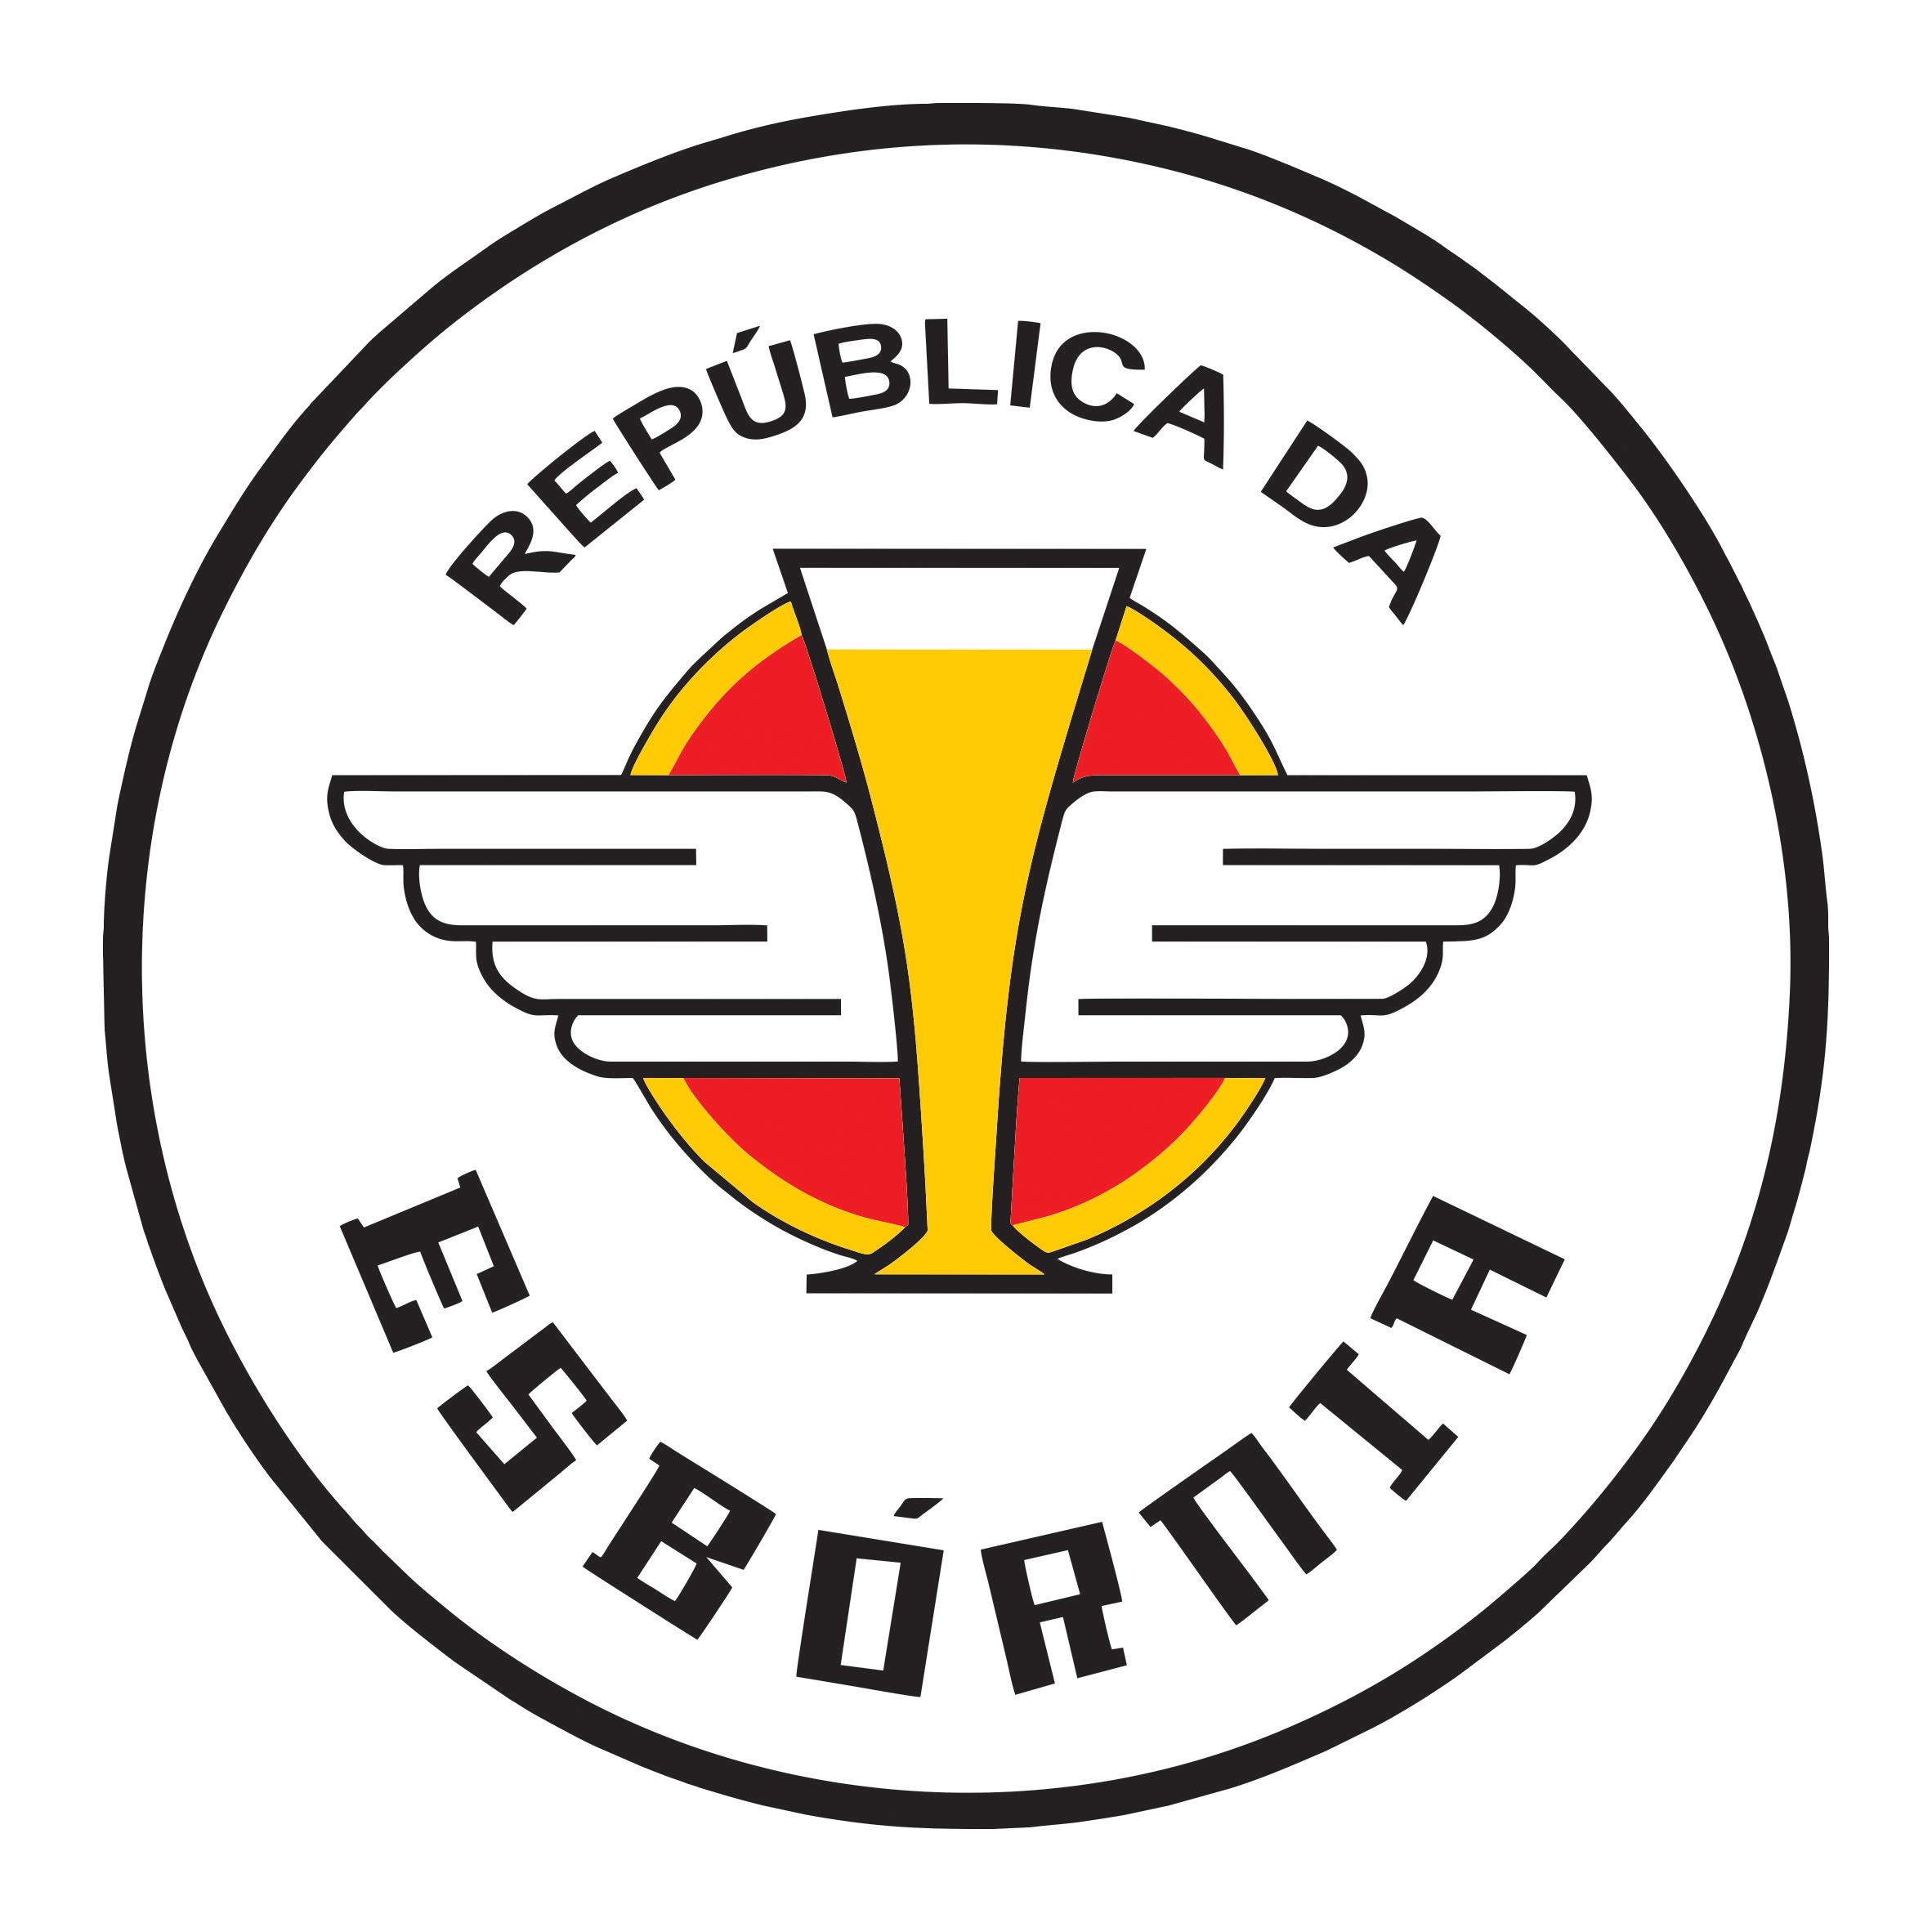 República da Esbórnia